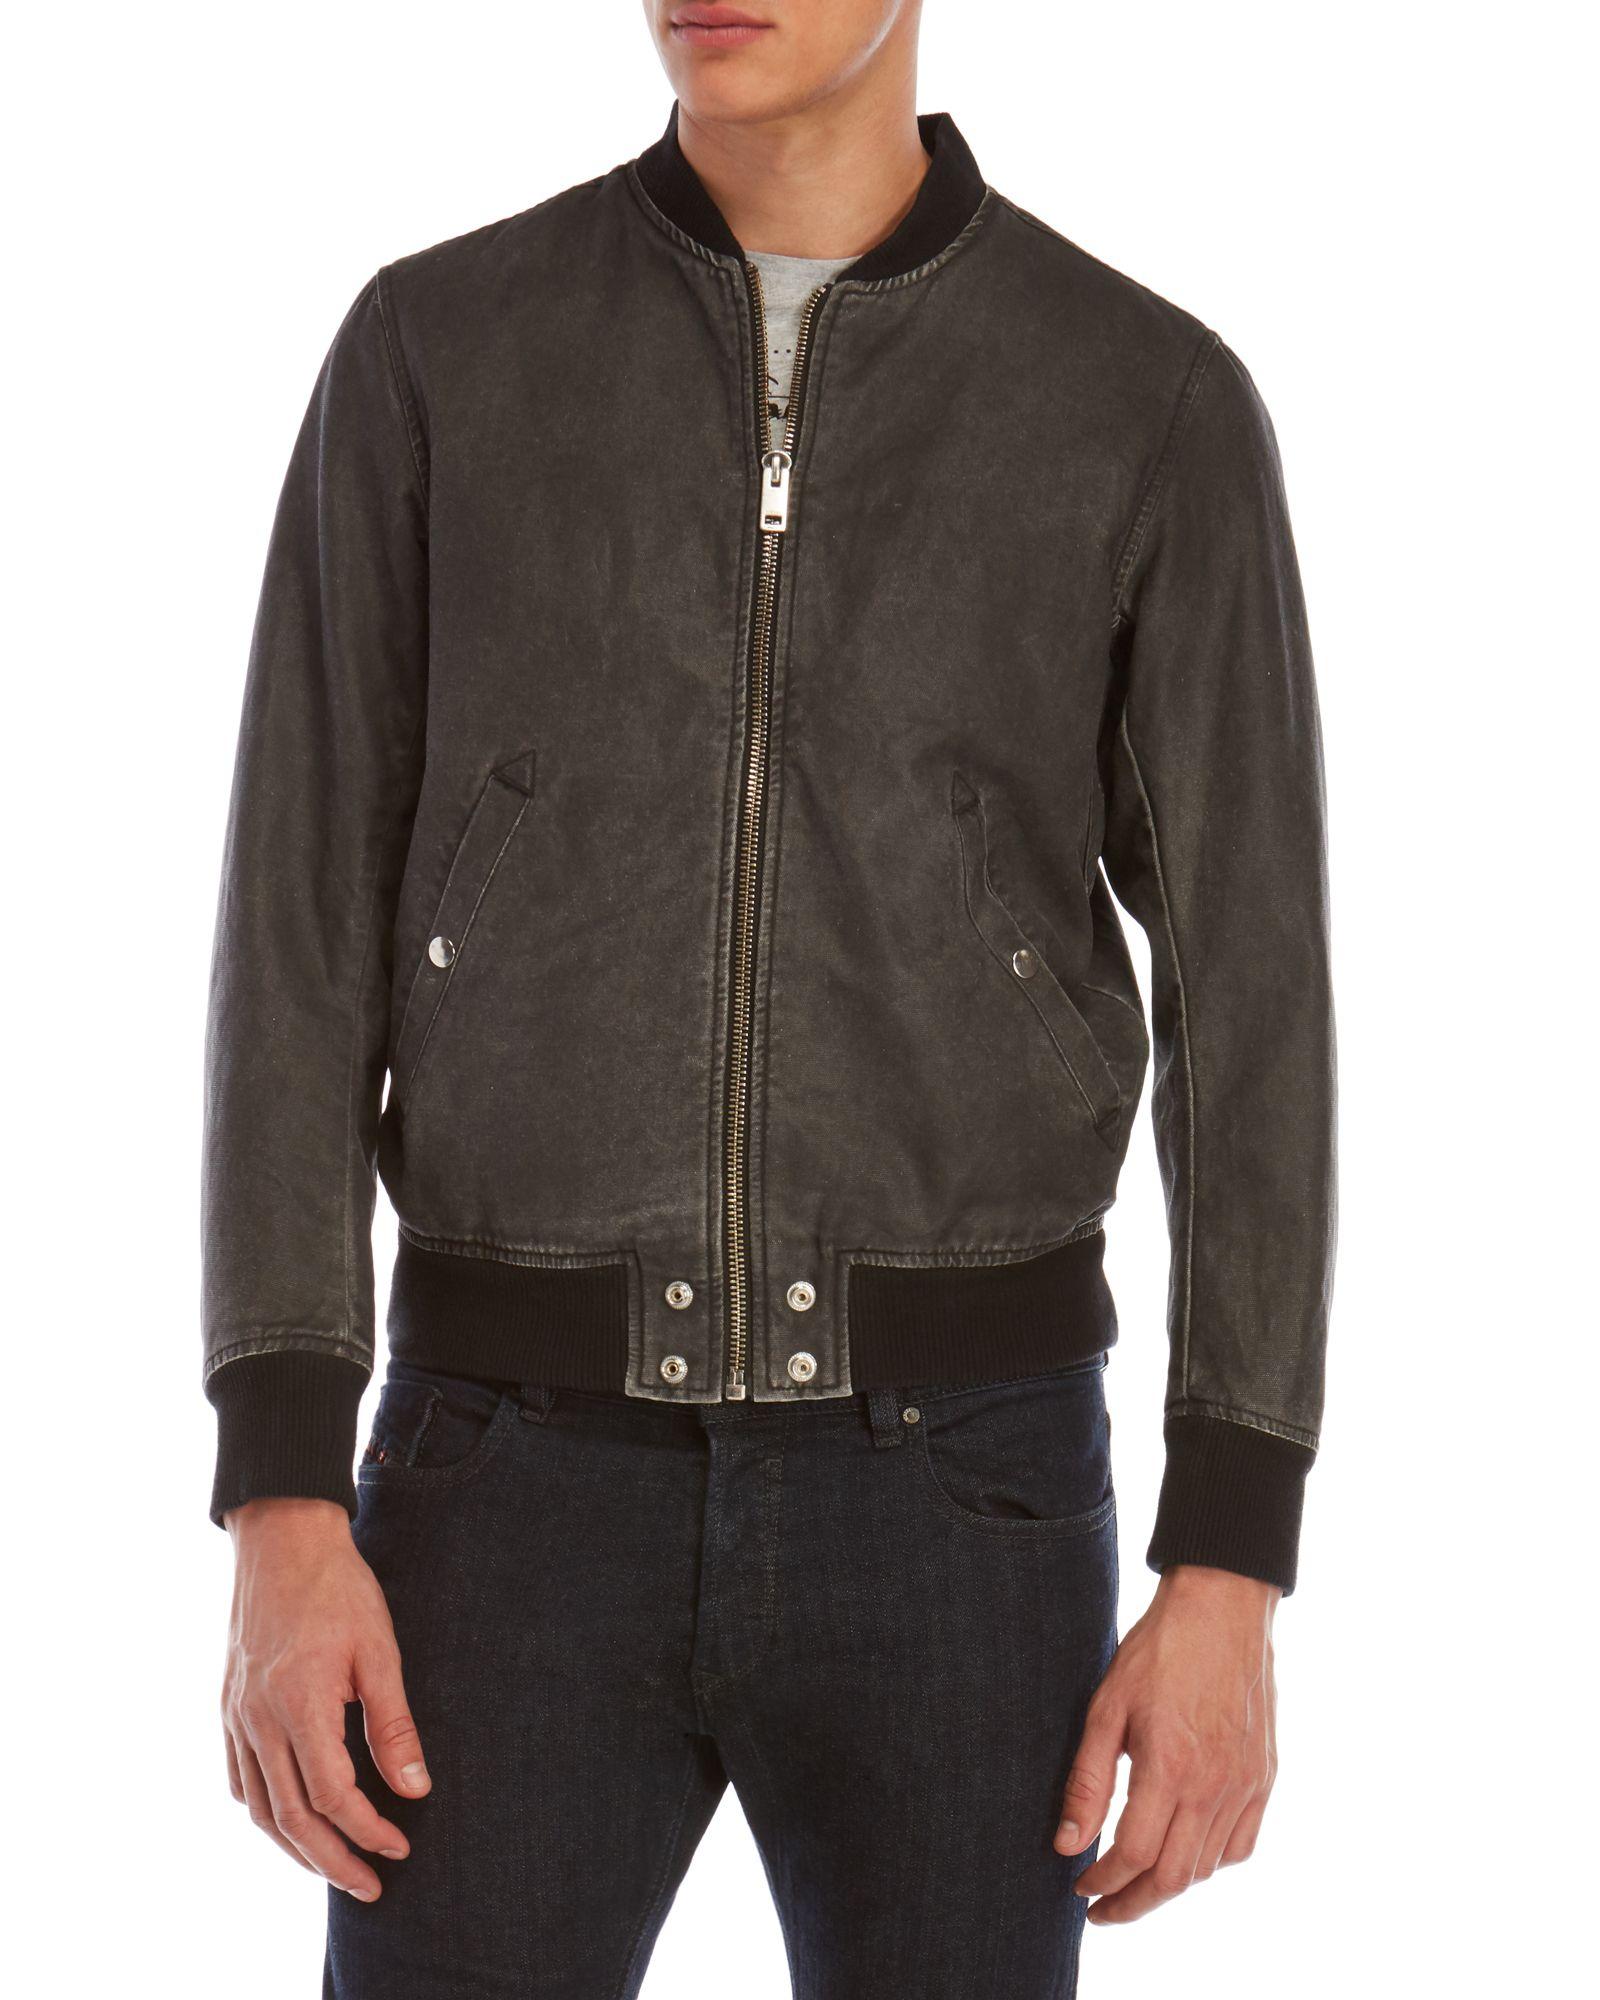 Diesel J-Holz Jacket *Apparel & Accessories* Holz